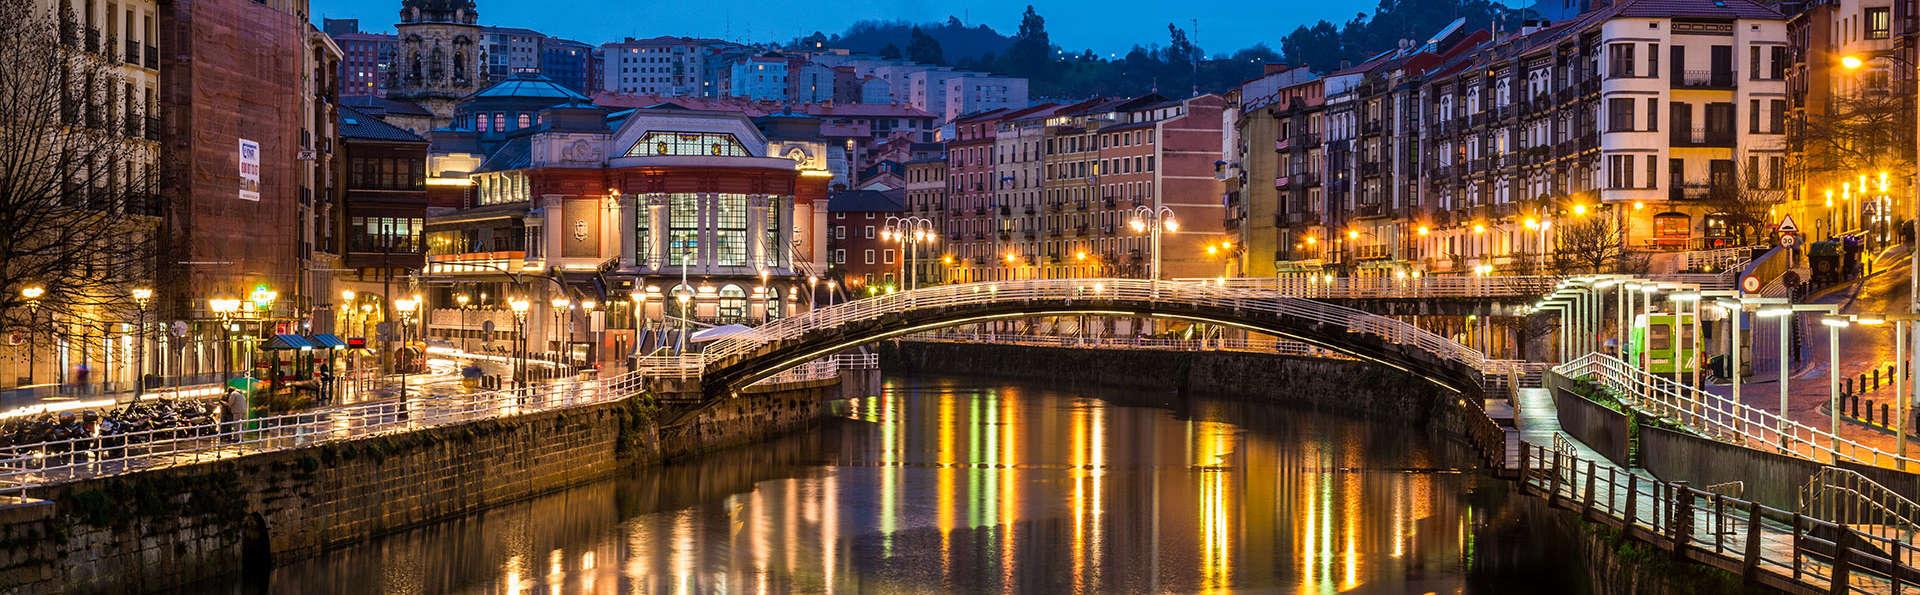 Hotel Arenal Bilbao - Edit_Bilbao.jpg